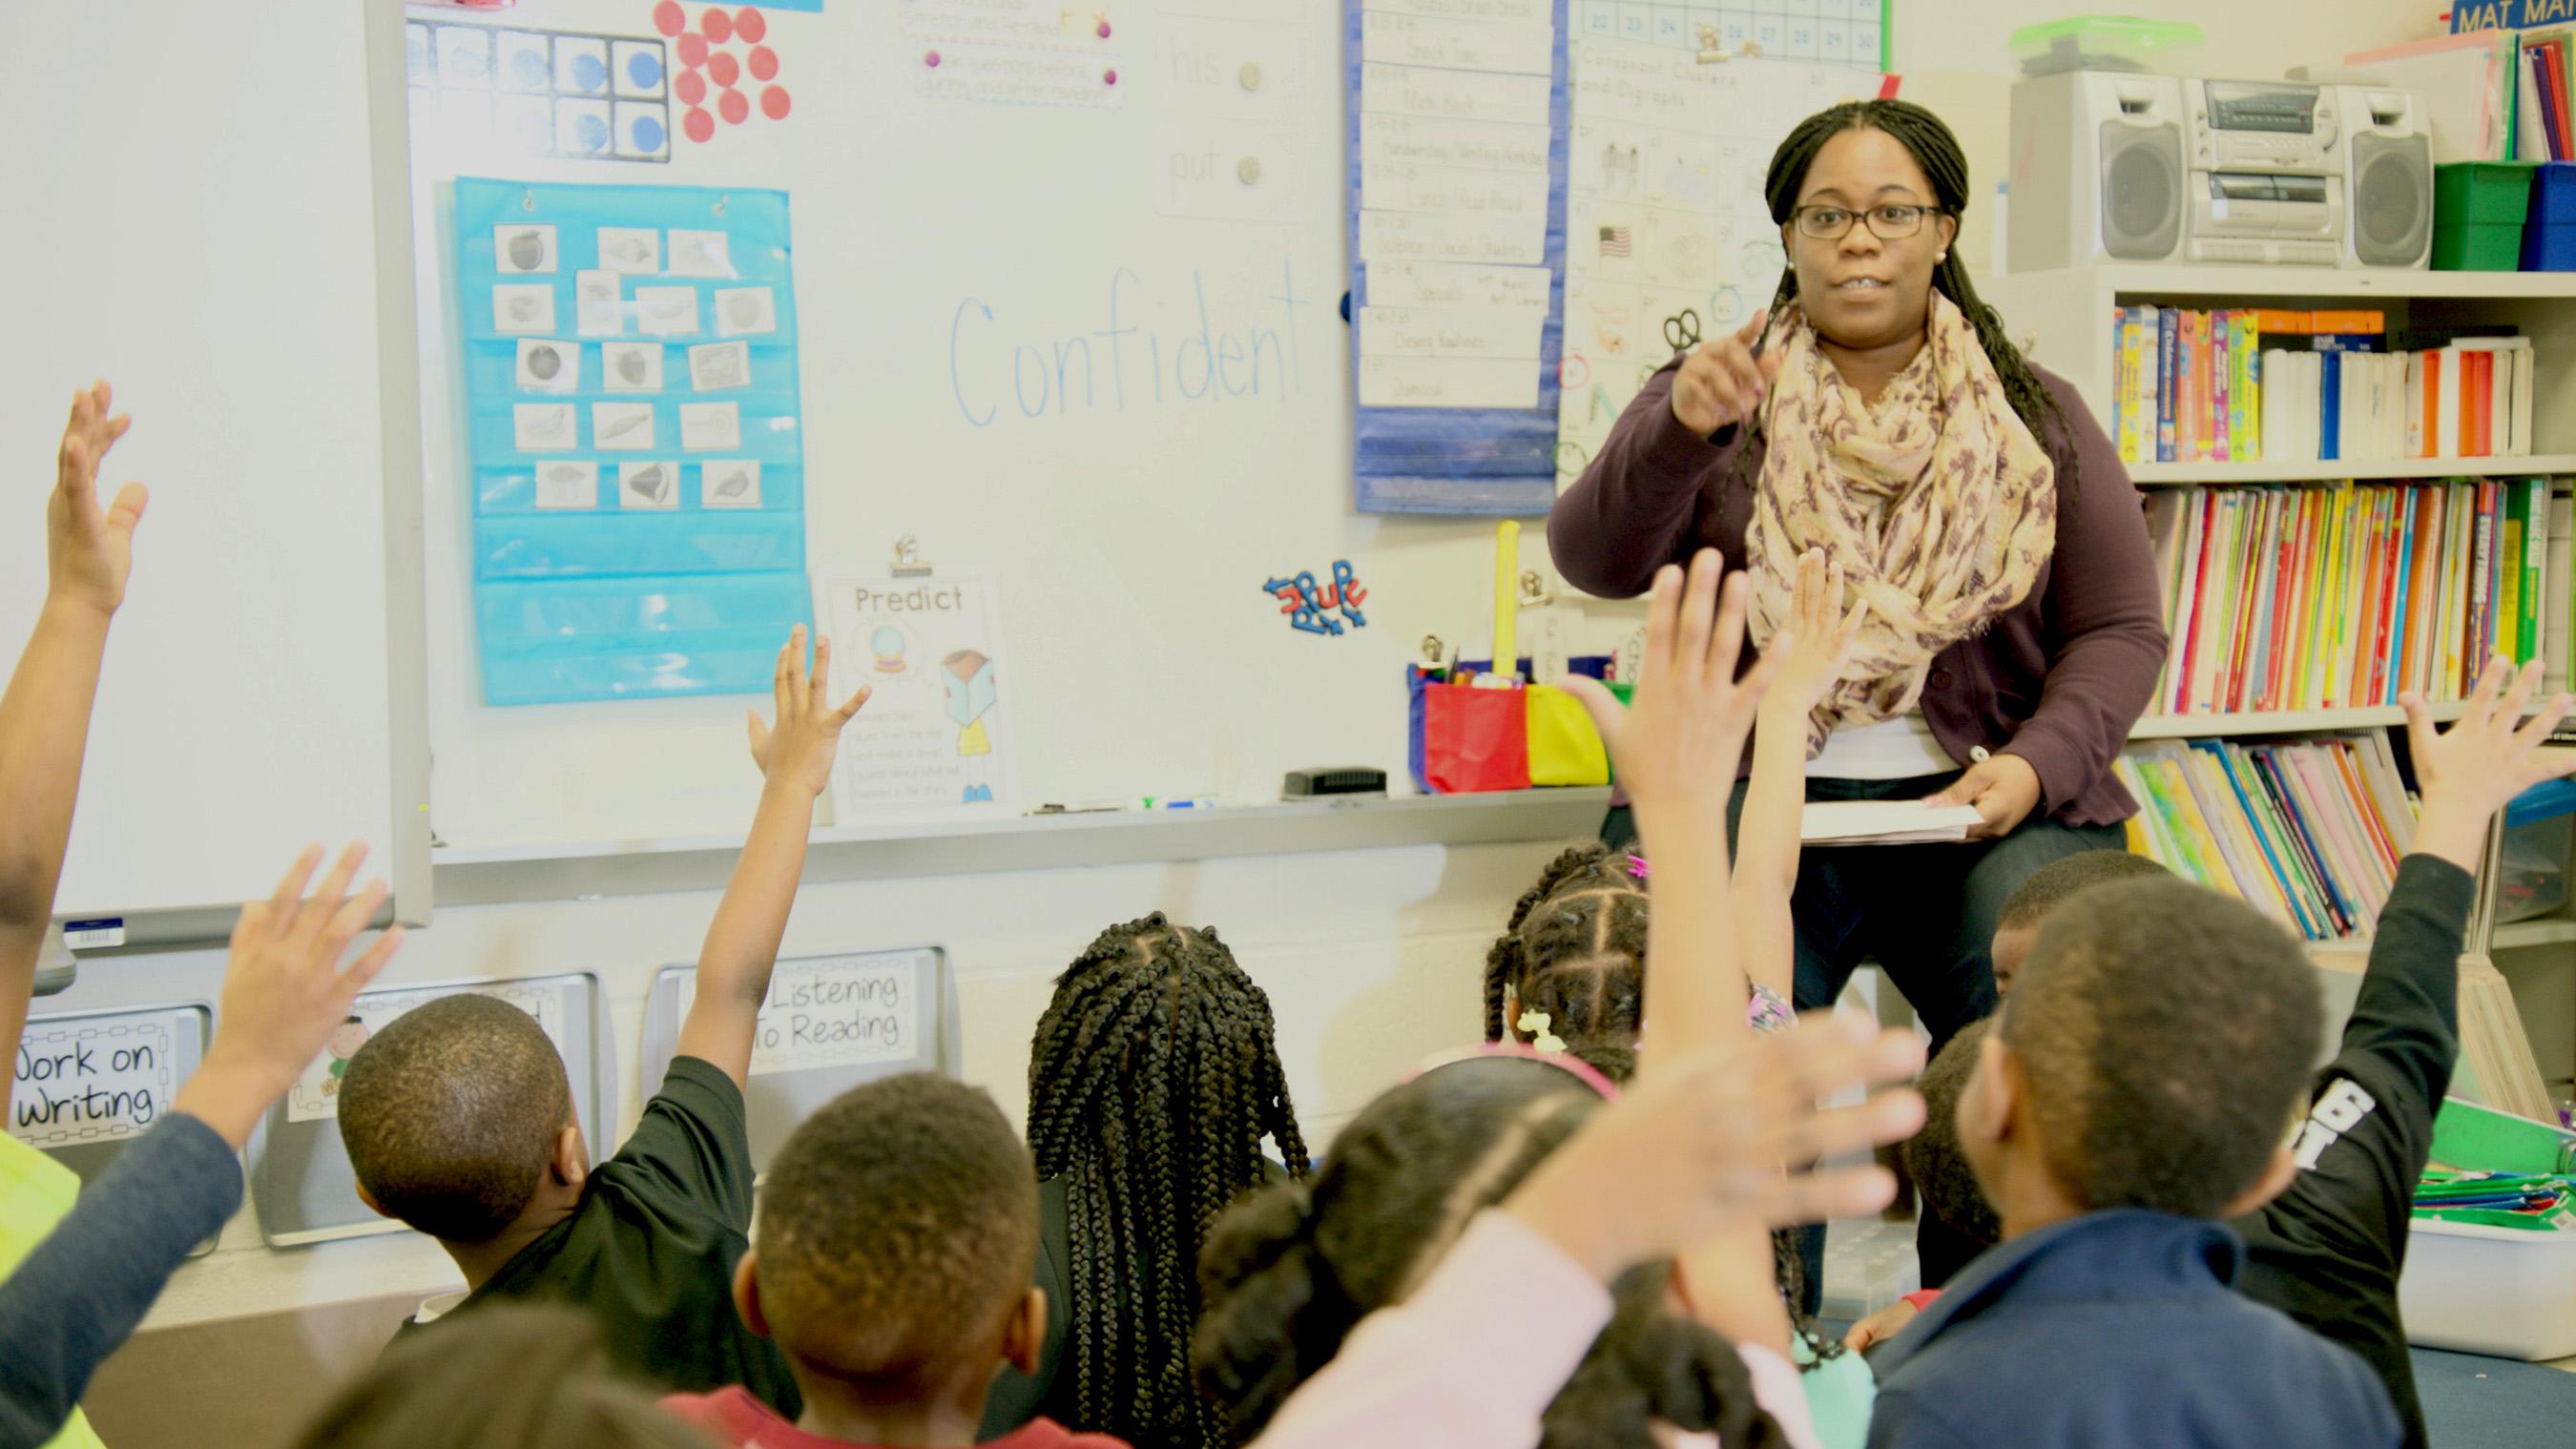 Care Counts™ program teachers surveyed saw that 89% of participants improved classroom participation